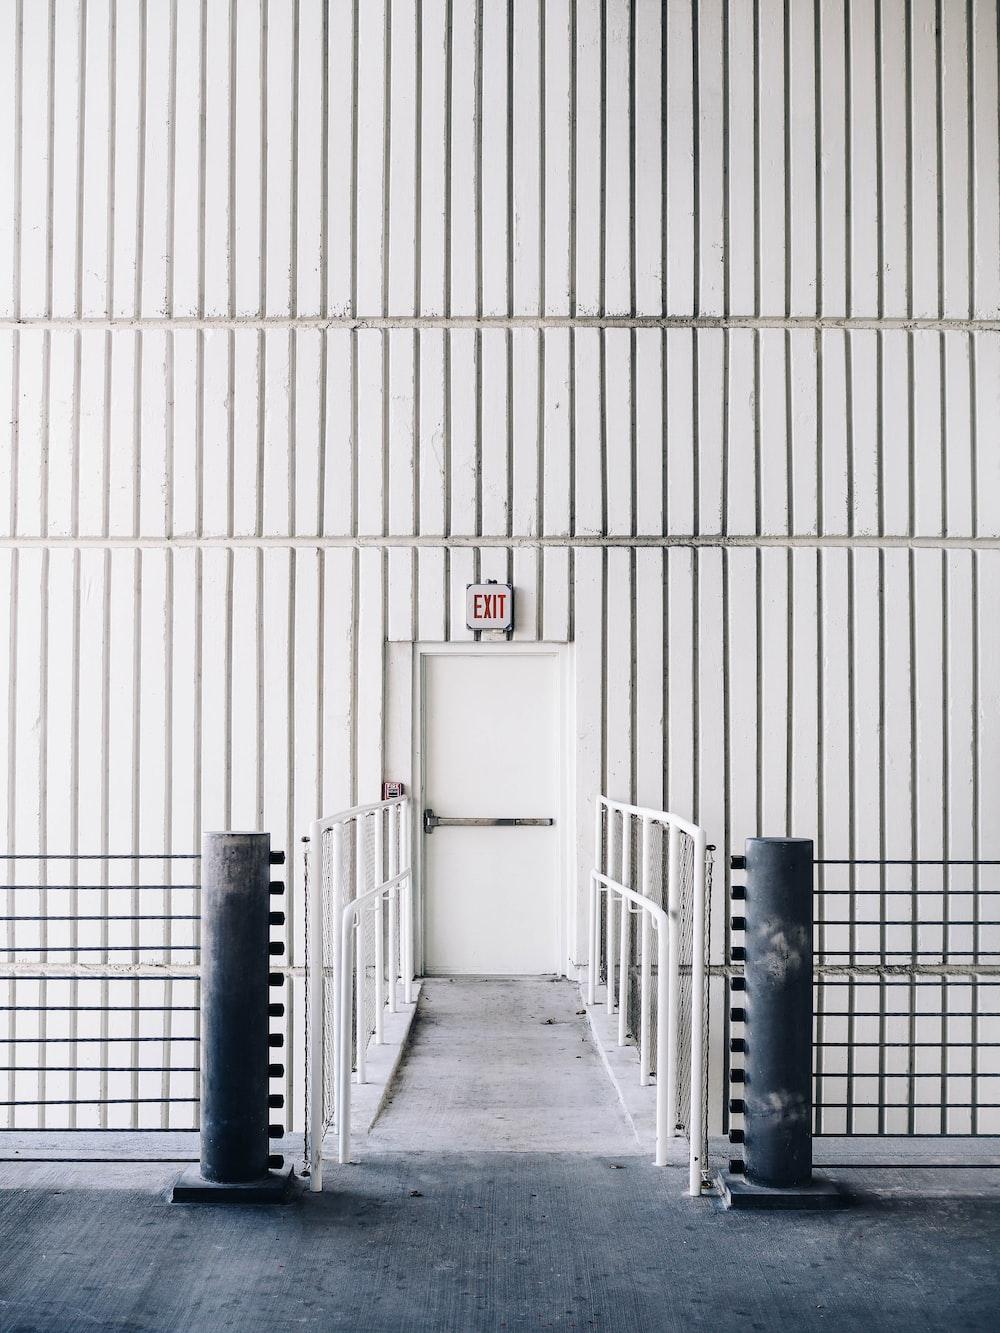 architectural photography of exit door with bridge